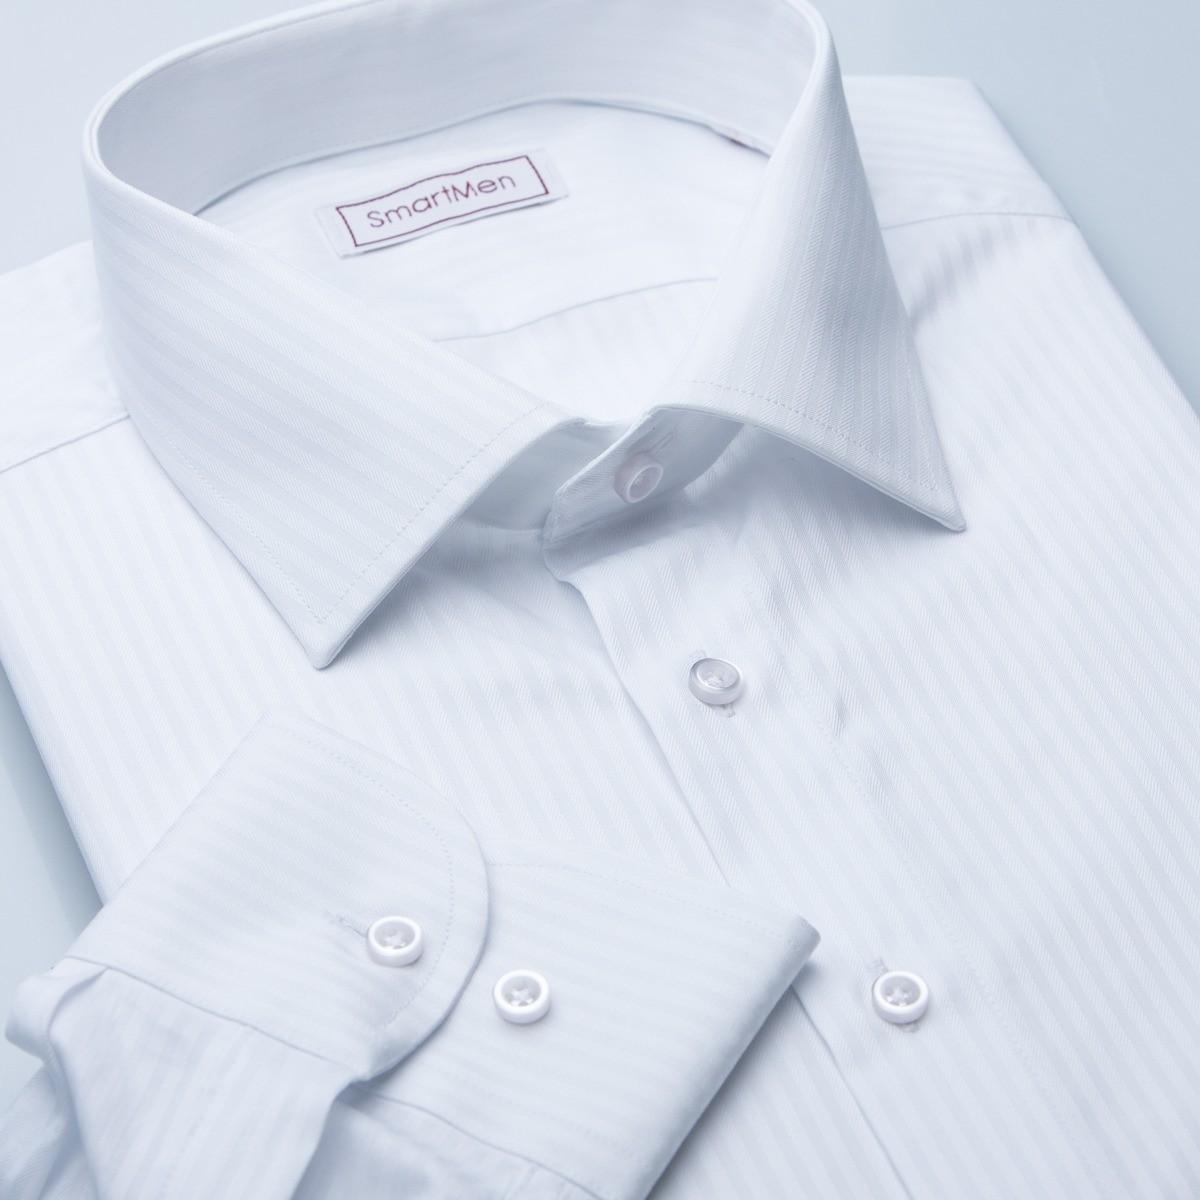 a0e770daa2b Pánská košile bílá Elegance Slim proužek